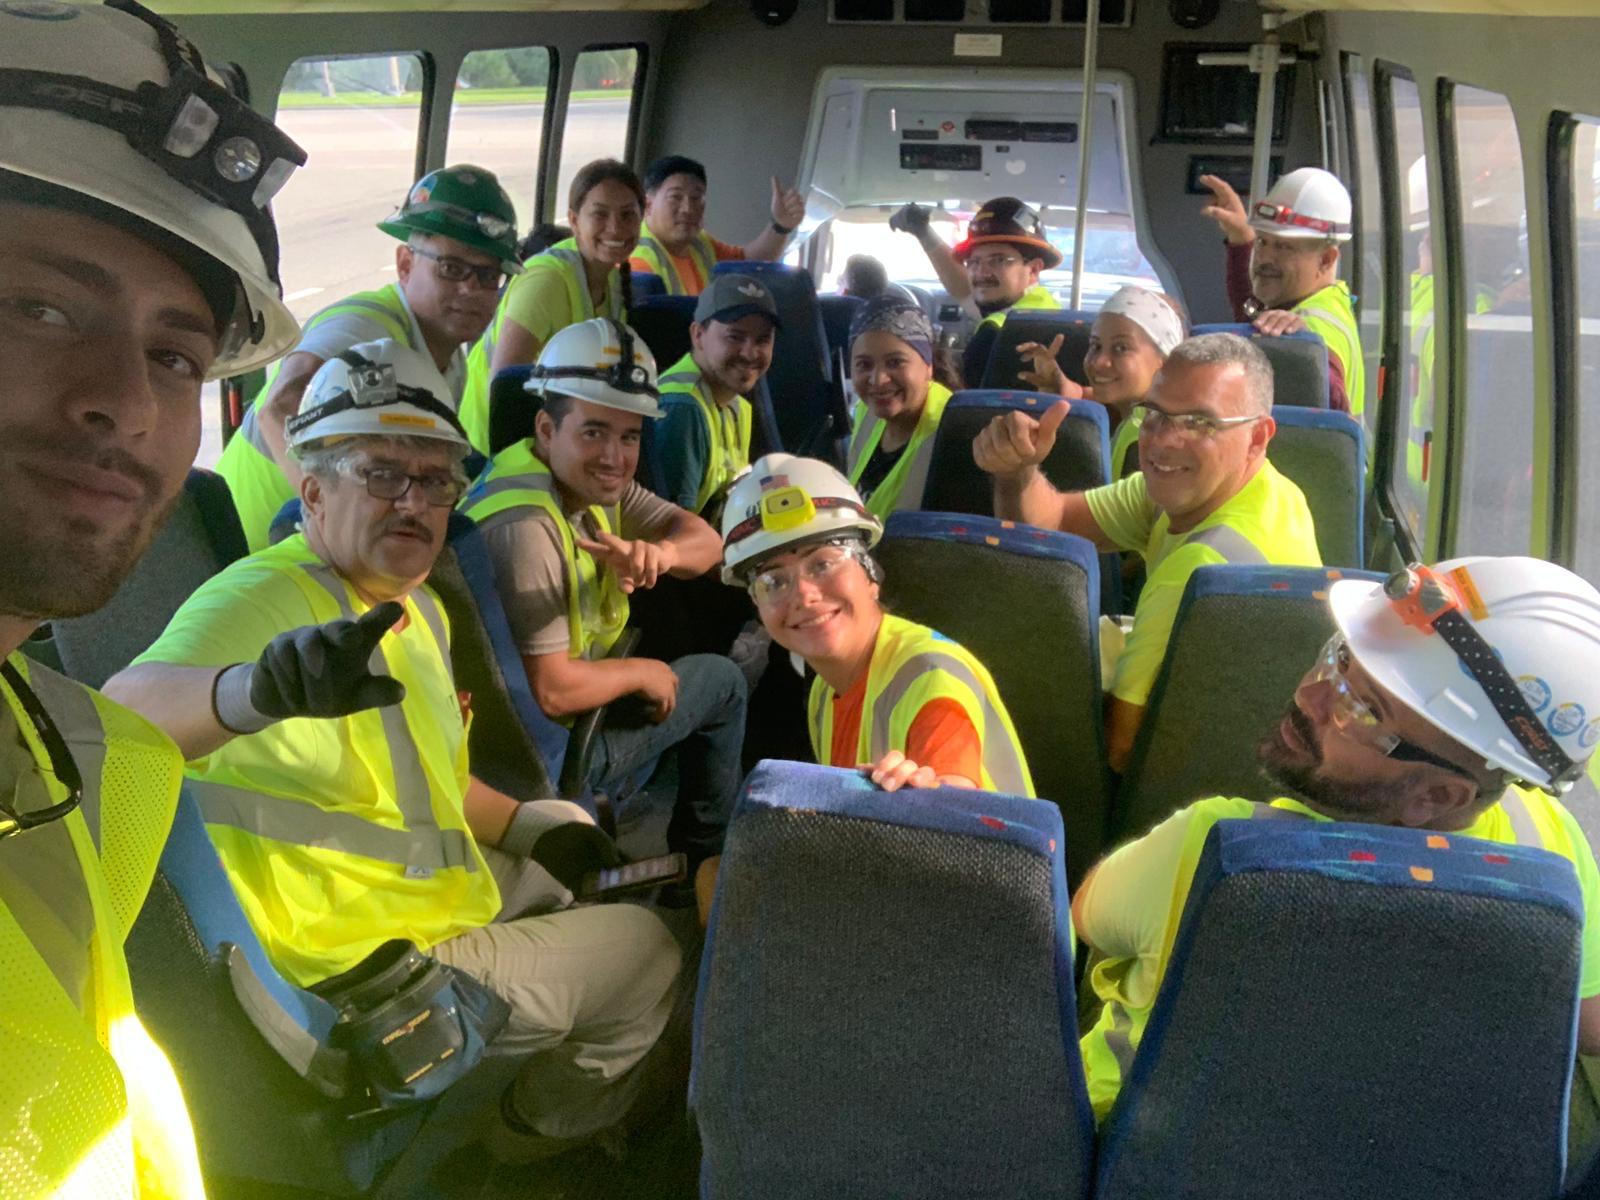 CEP Crew On The Bus